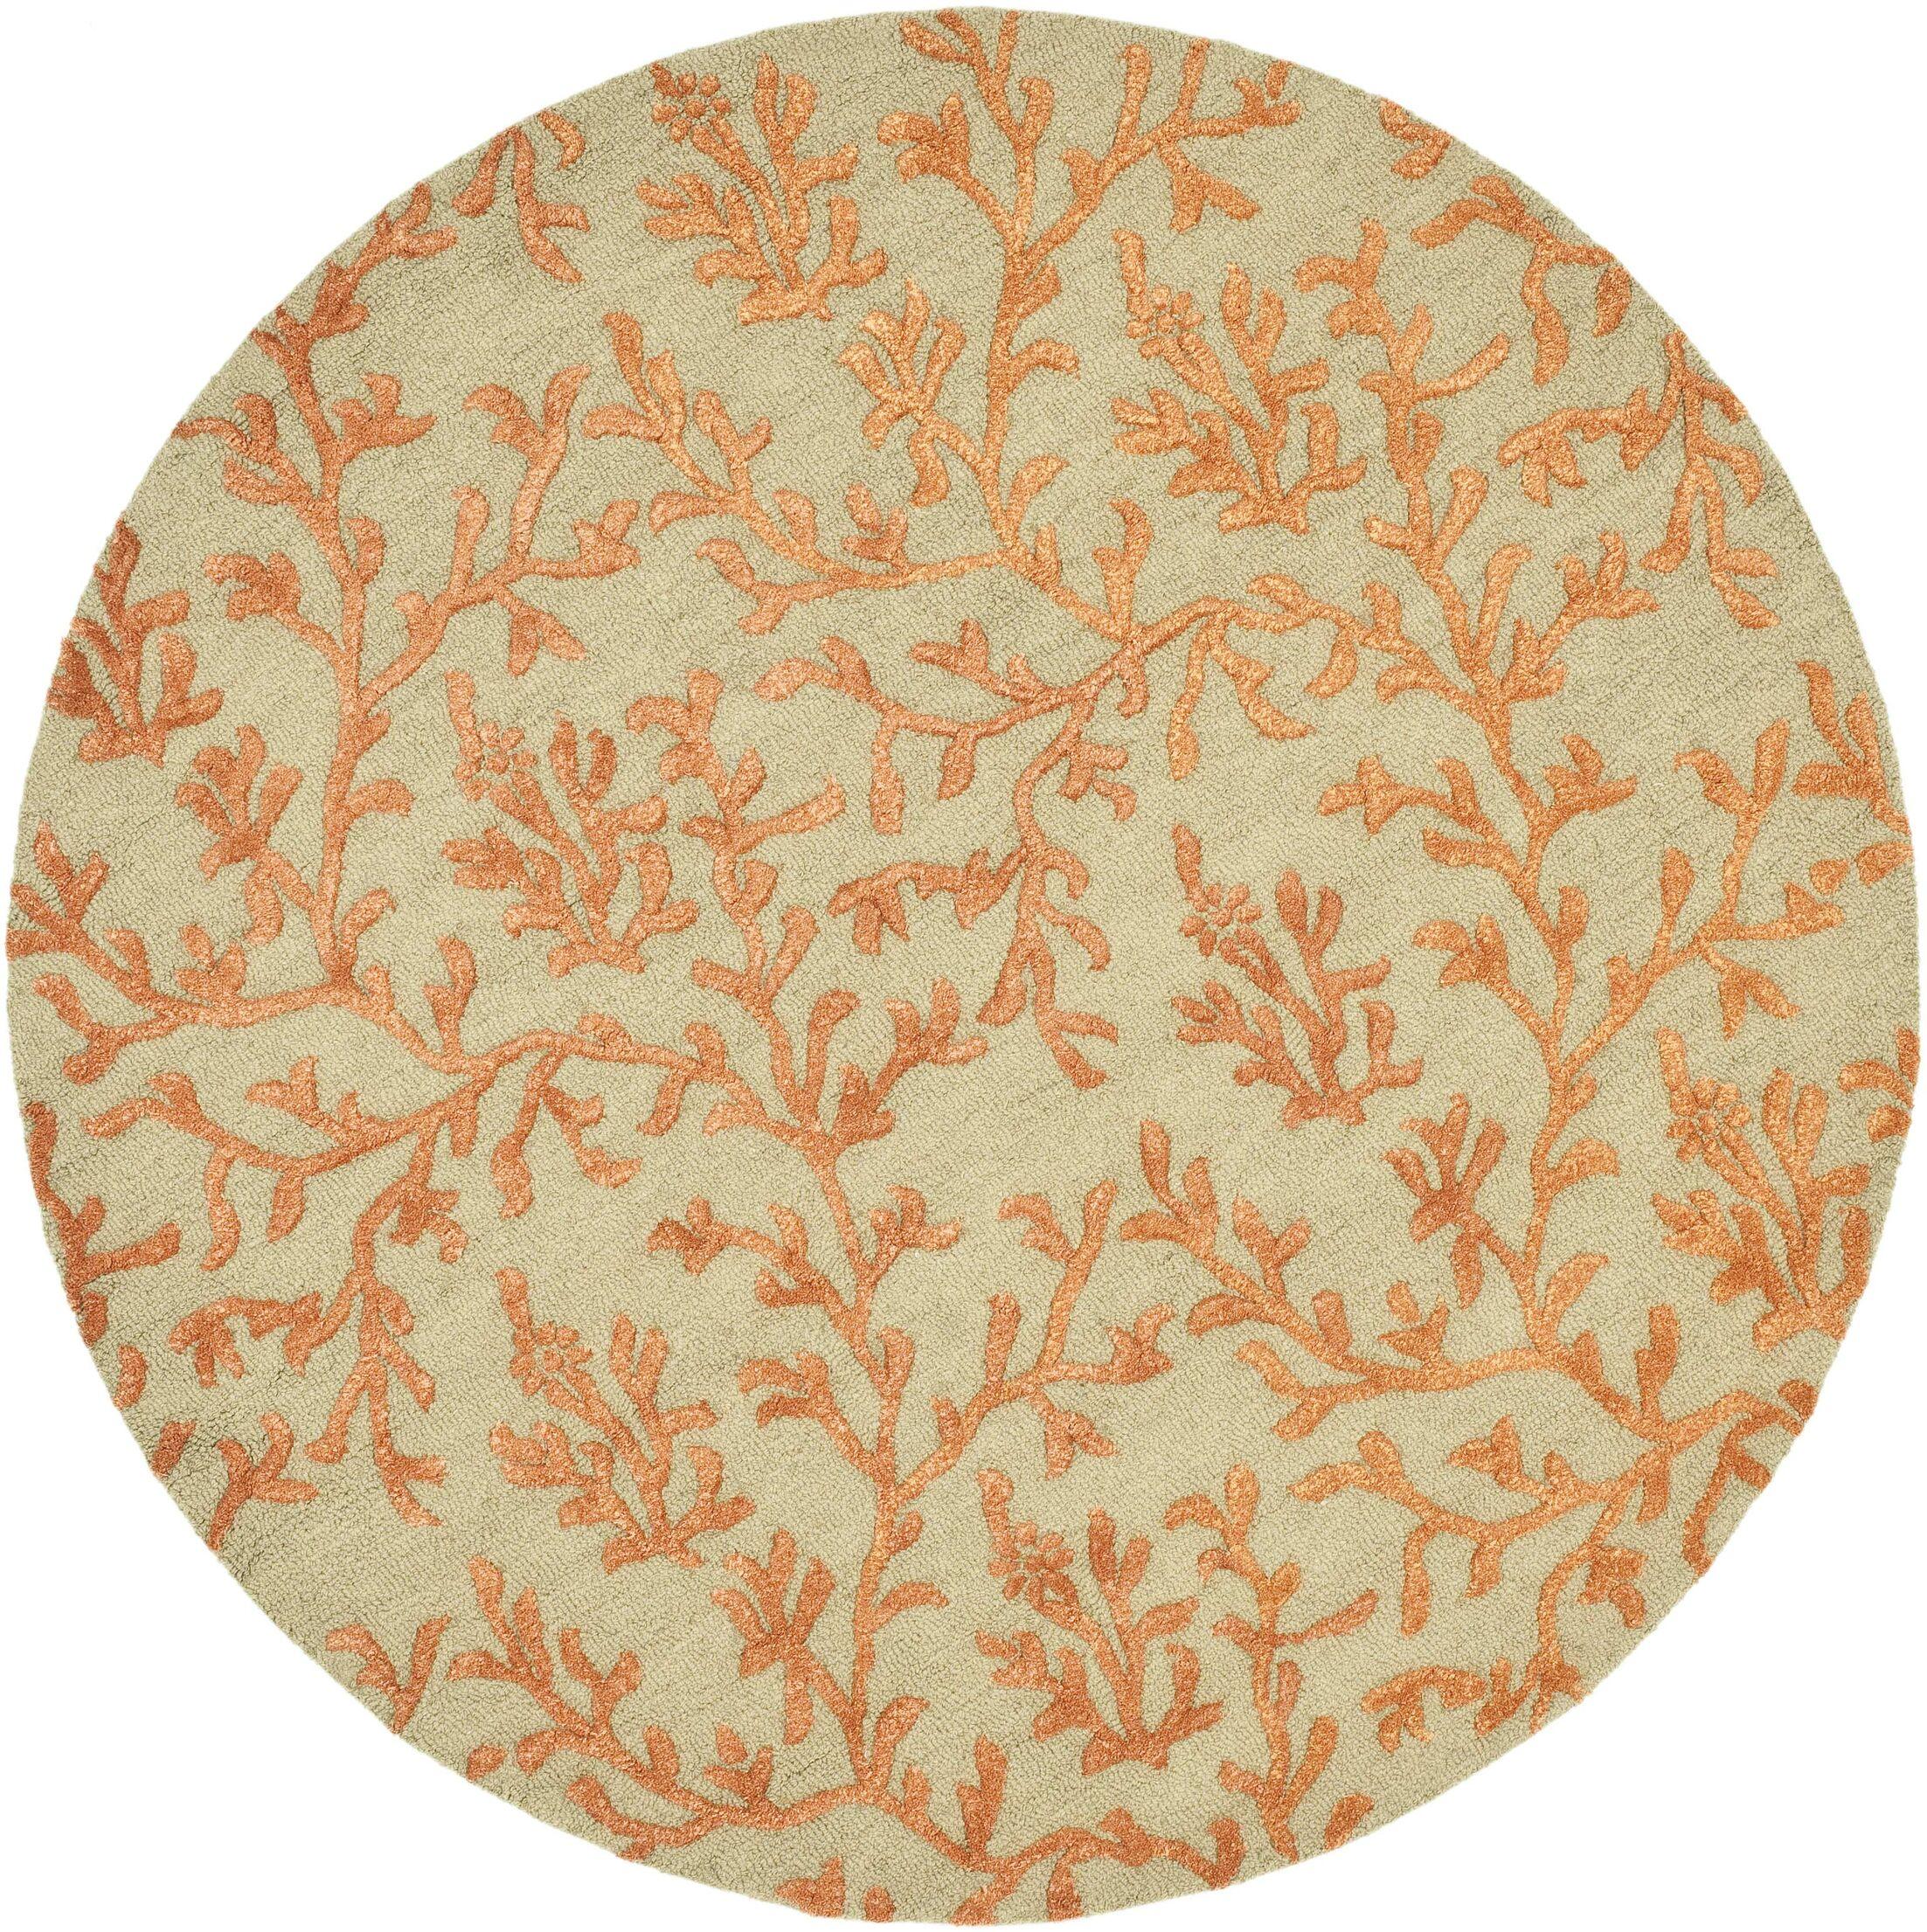 Orin Green/Gold Area Rug Rug Size: Rectangle 5' x 8'